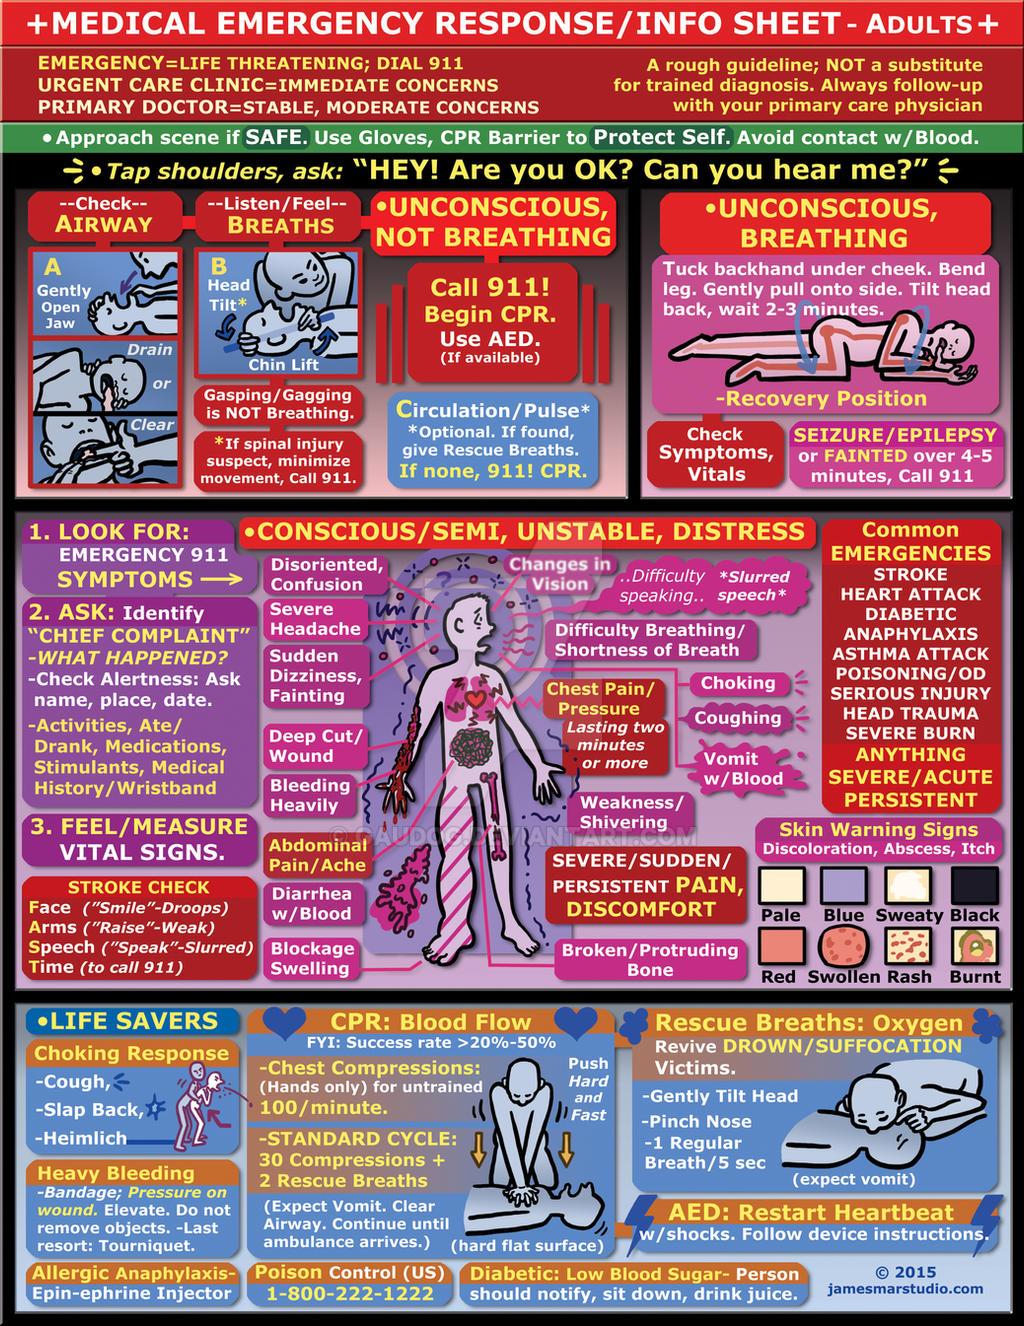 Emergency Response Info Sheet - Adults